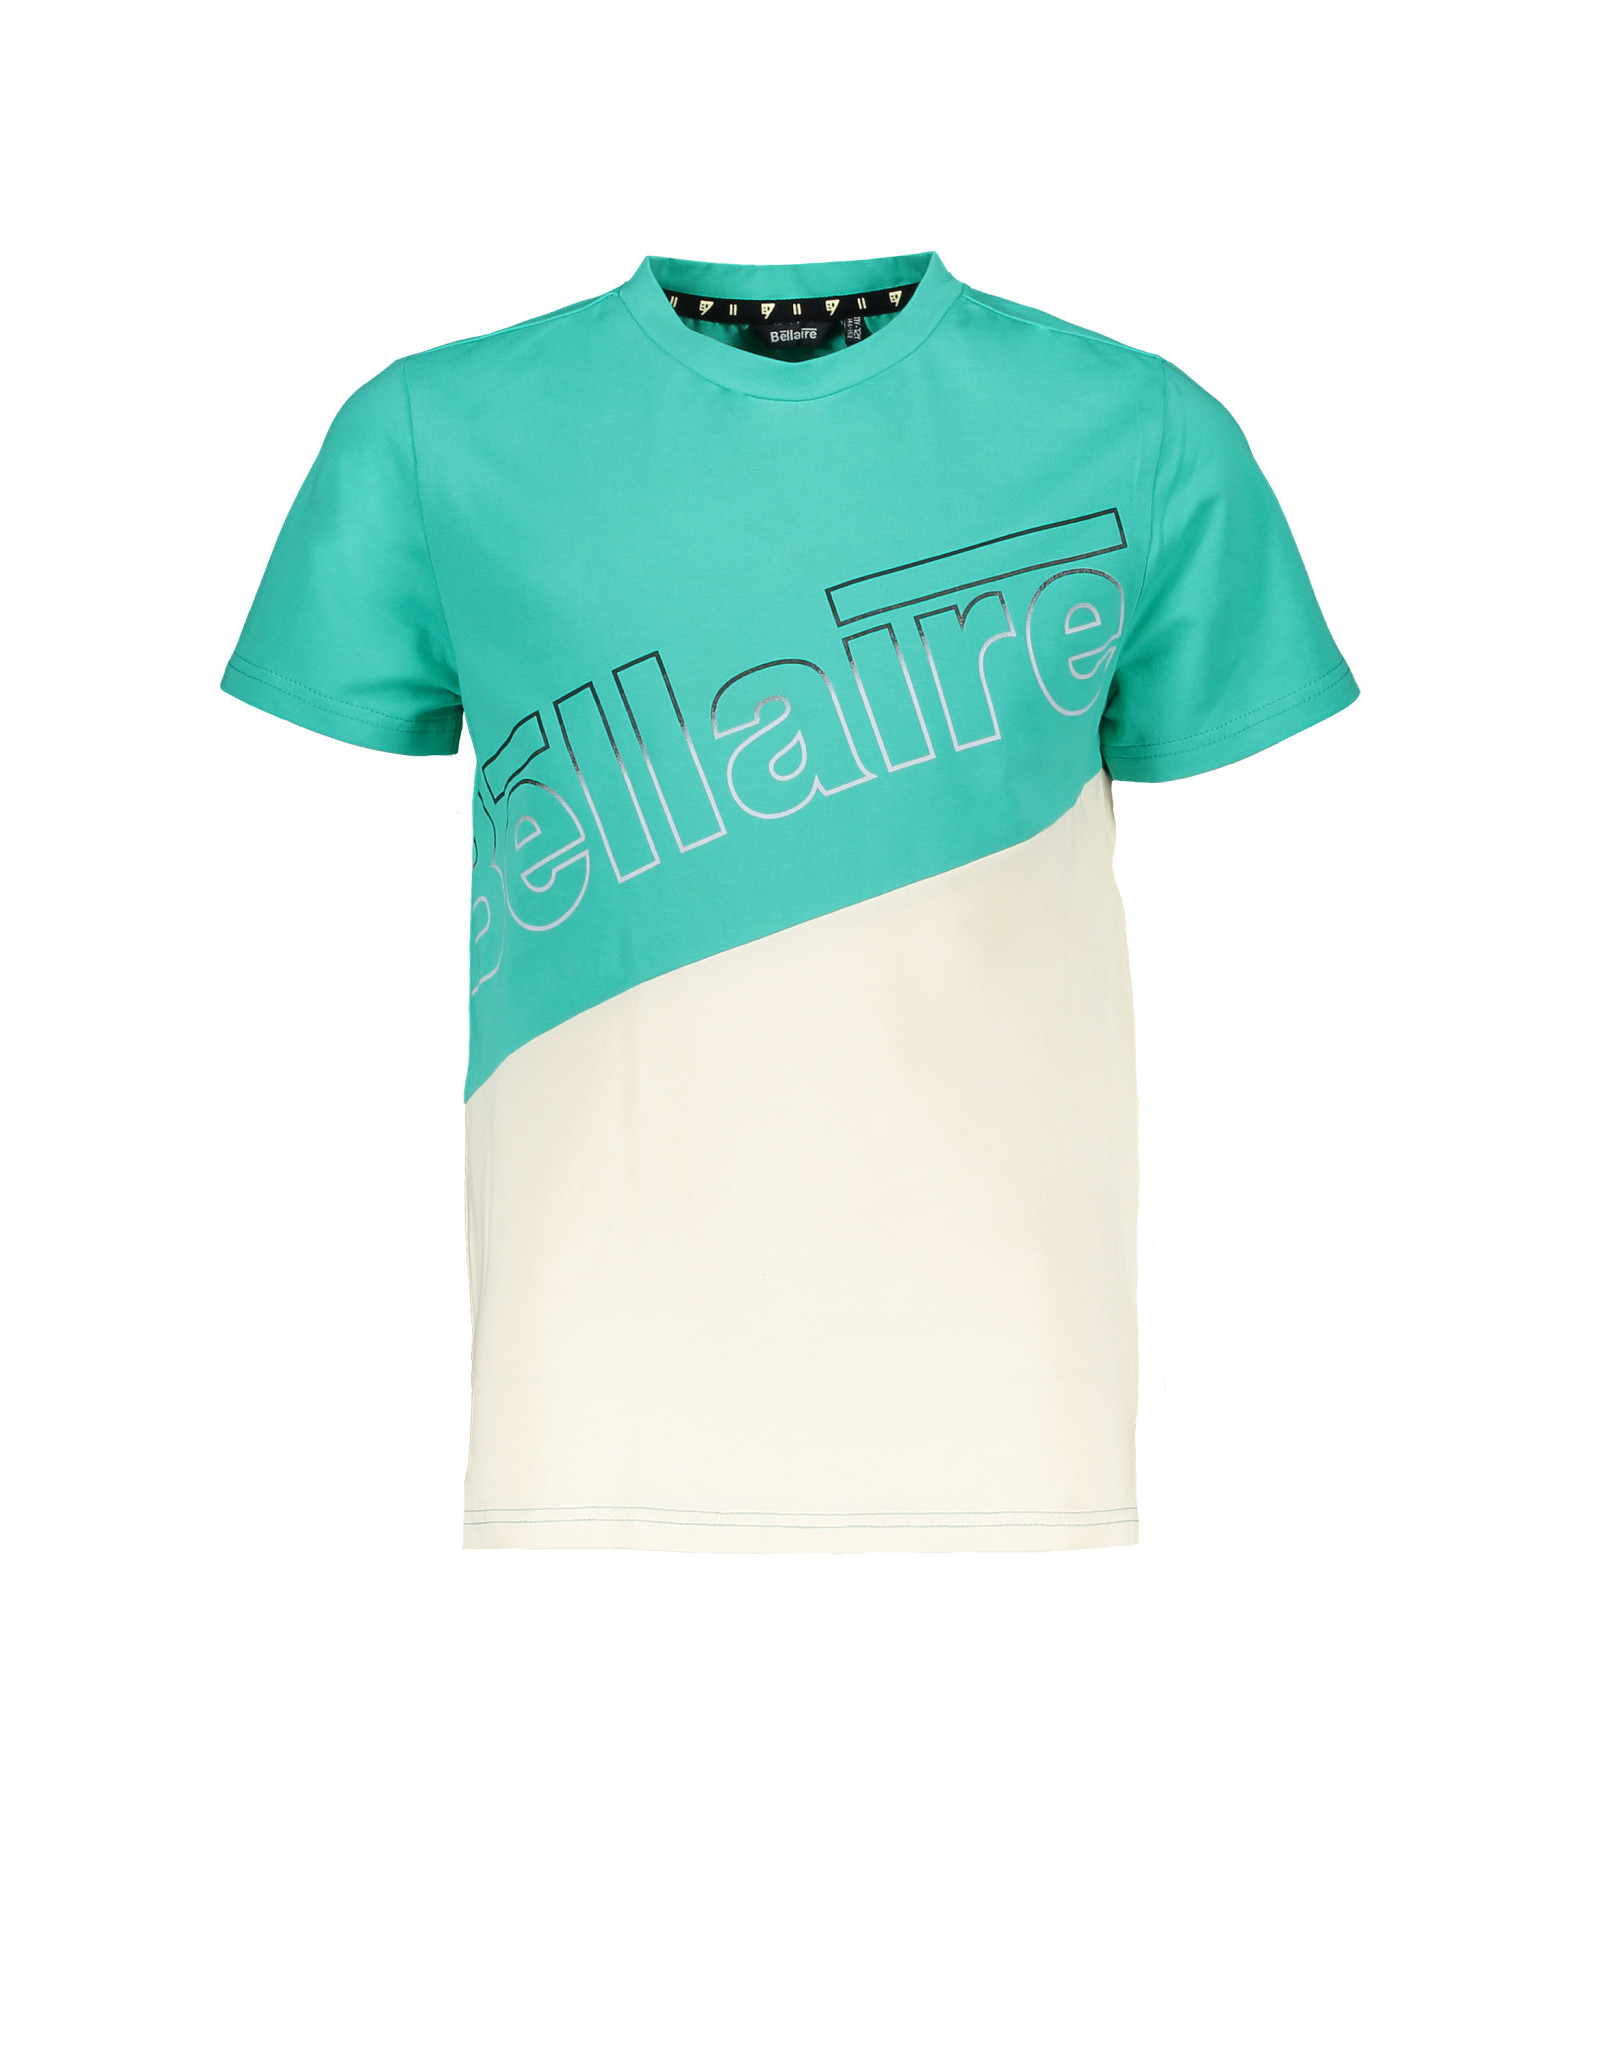 Bellaire Bellaire jongens t-shirt Kusy Sea Green